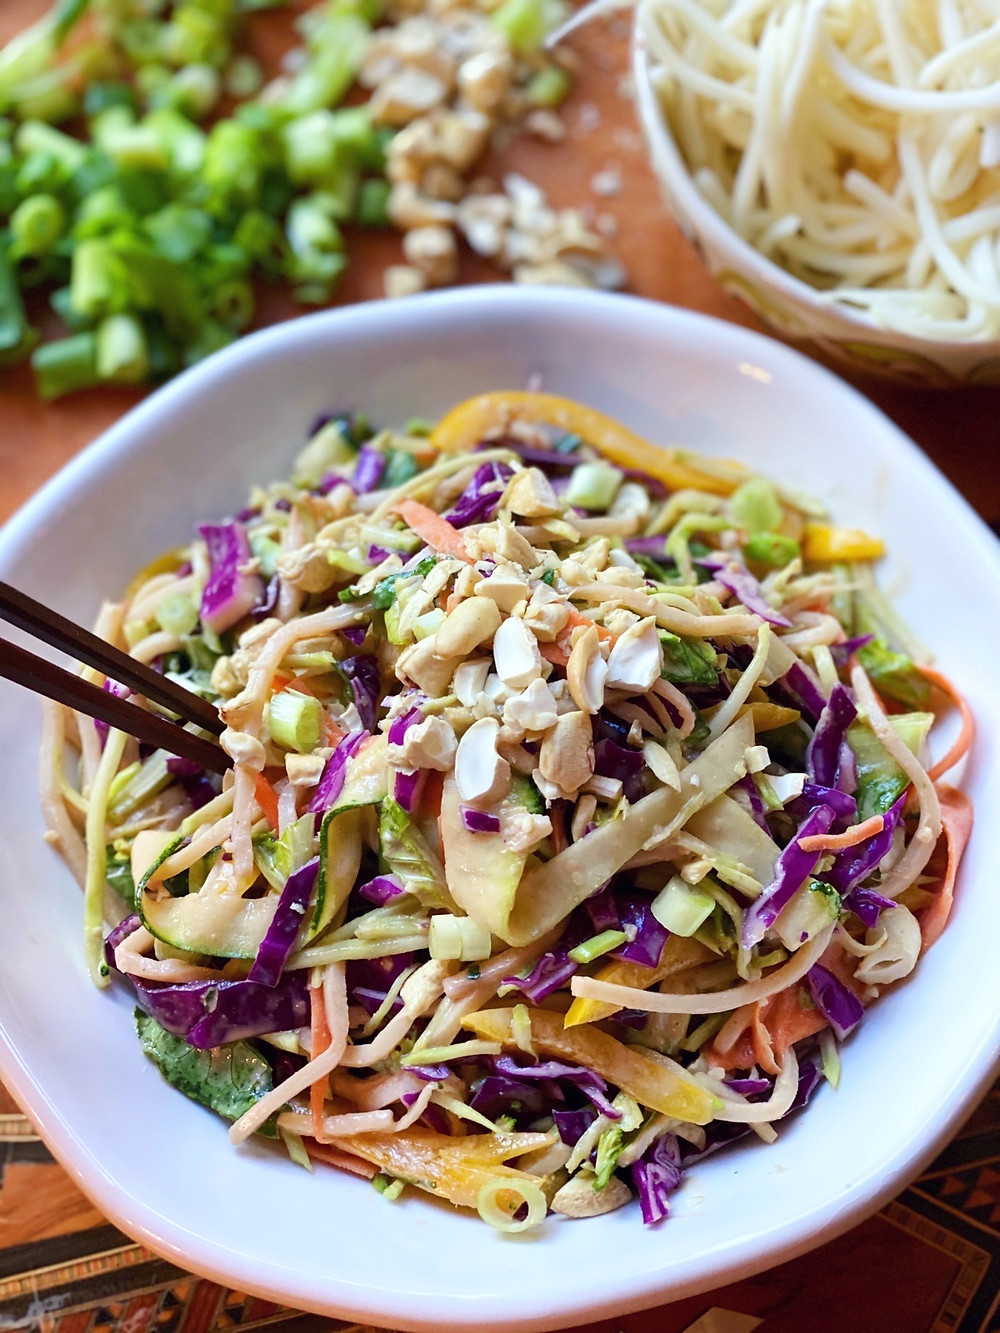 Ketogenic recipes found at Healthy Life Selections website by Marsha Merington Keto friendly pasta dishes